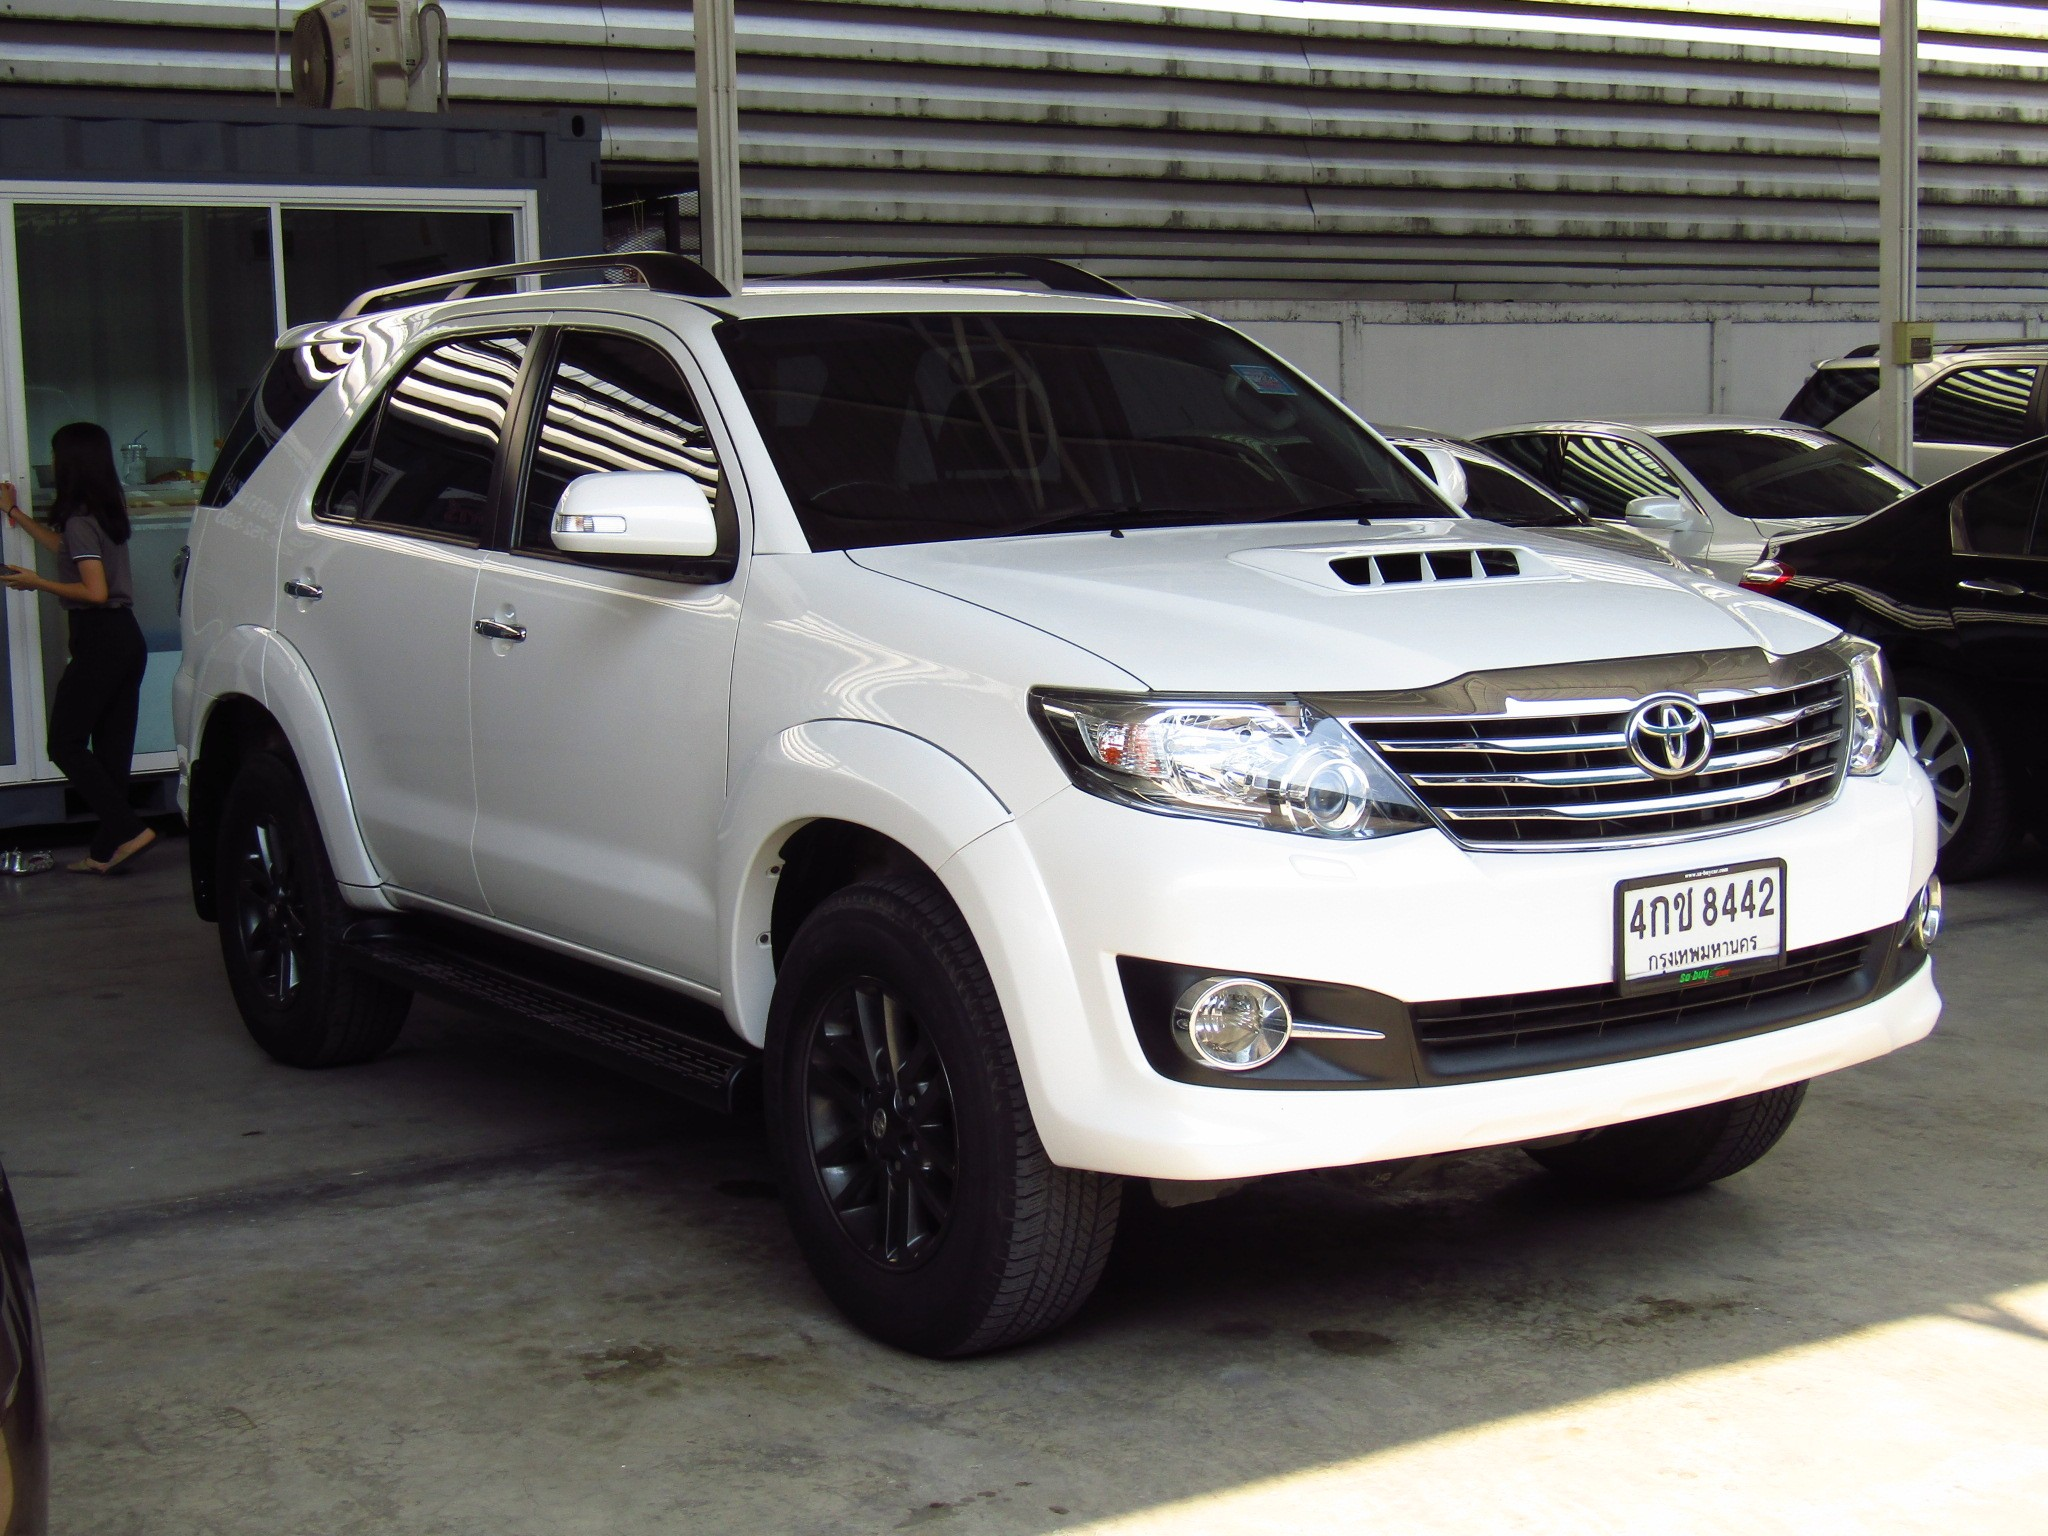 Toyota Fortuner (92,xxx) 3.0 V NAVI  4WD AT SUV